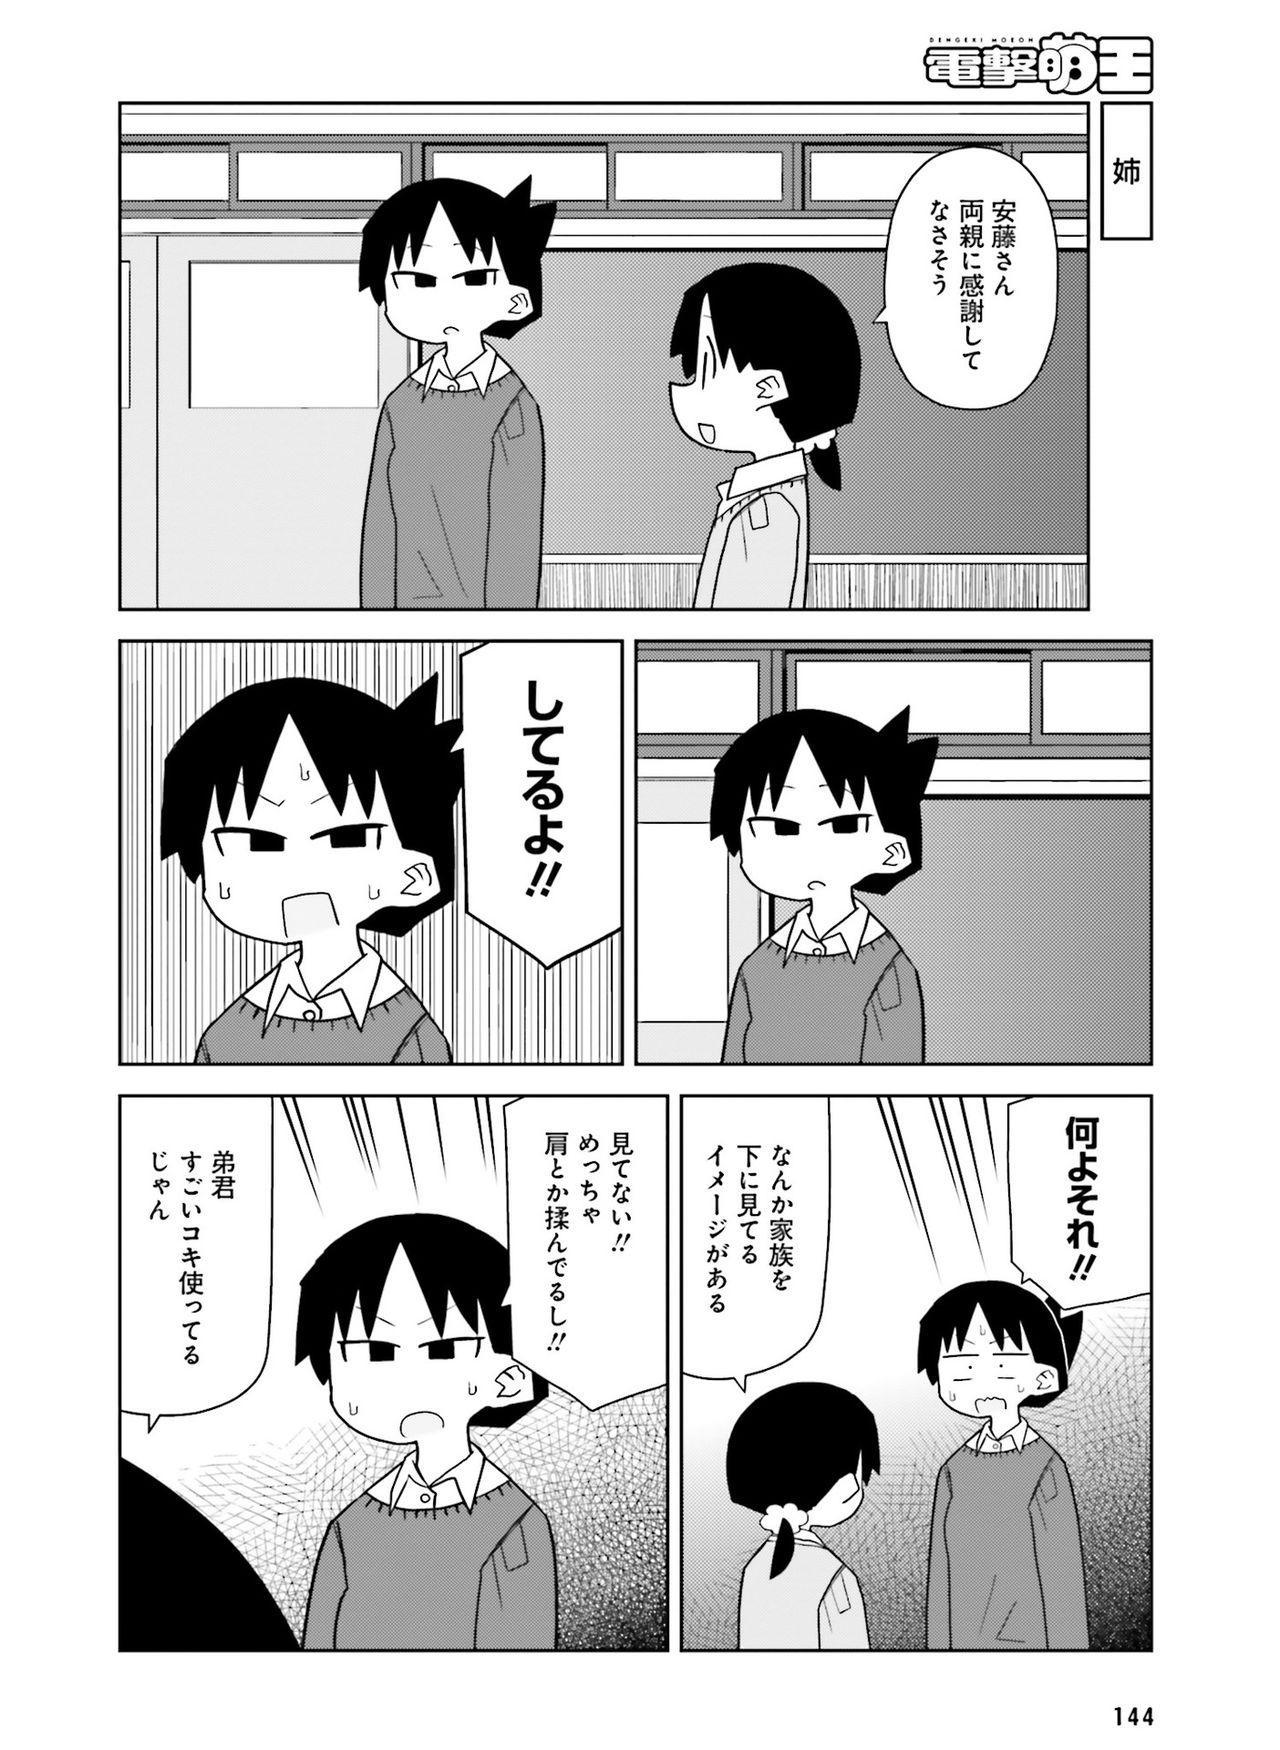 Dengeki Moeoh 2017-06 123